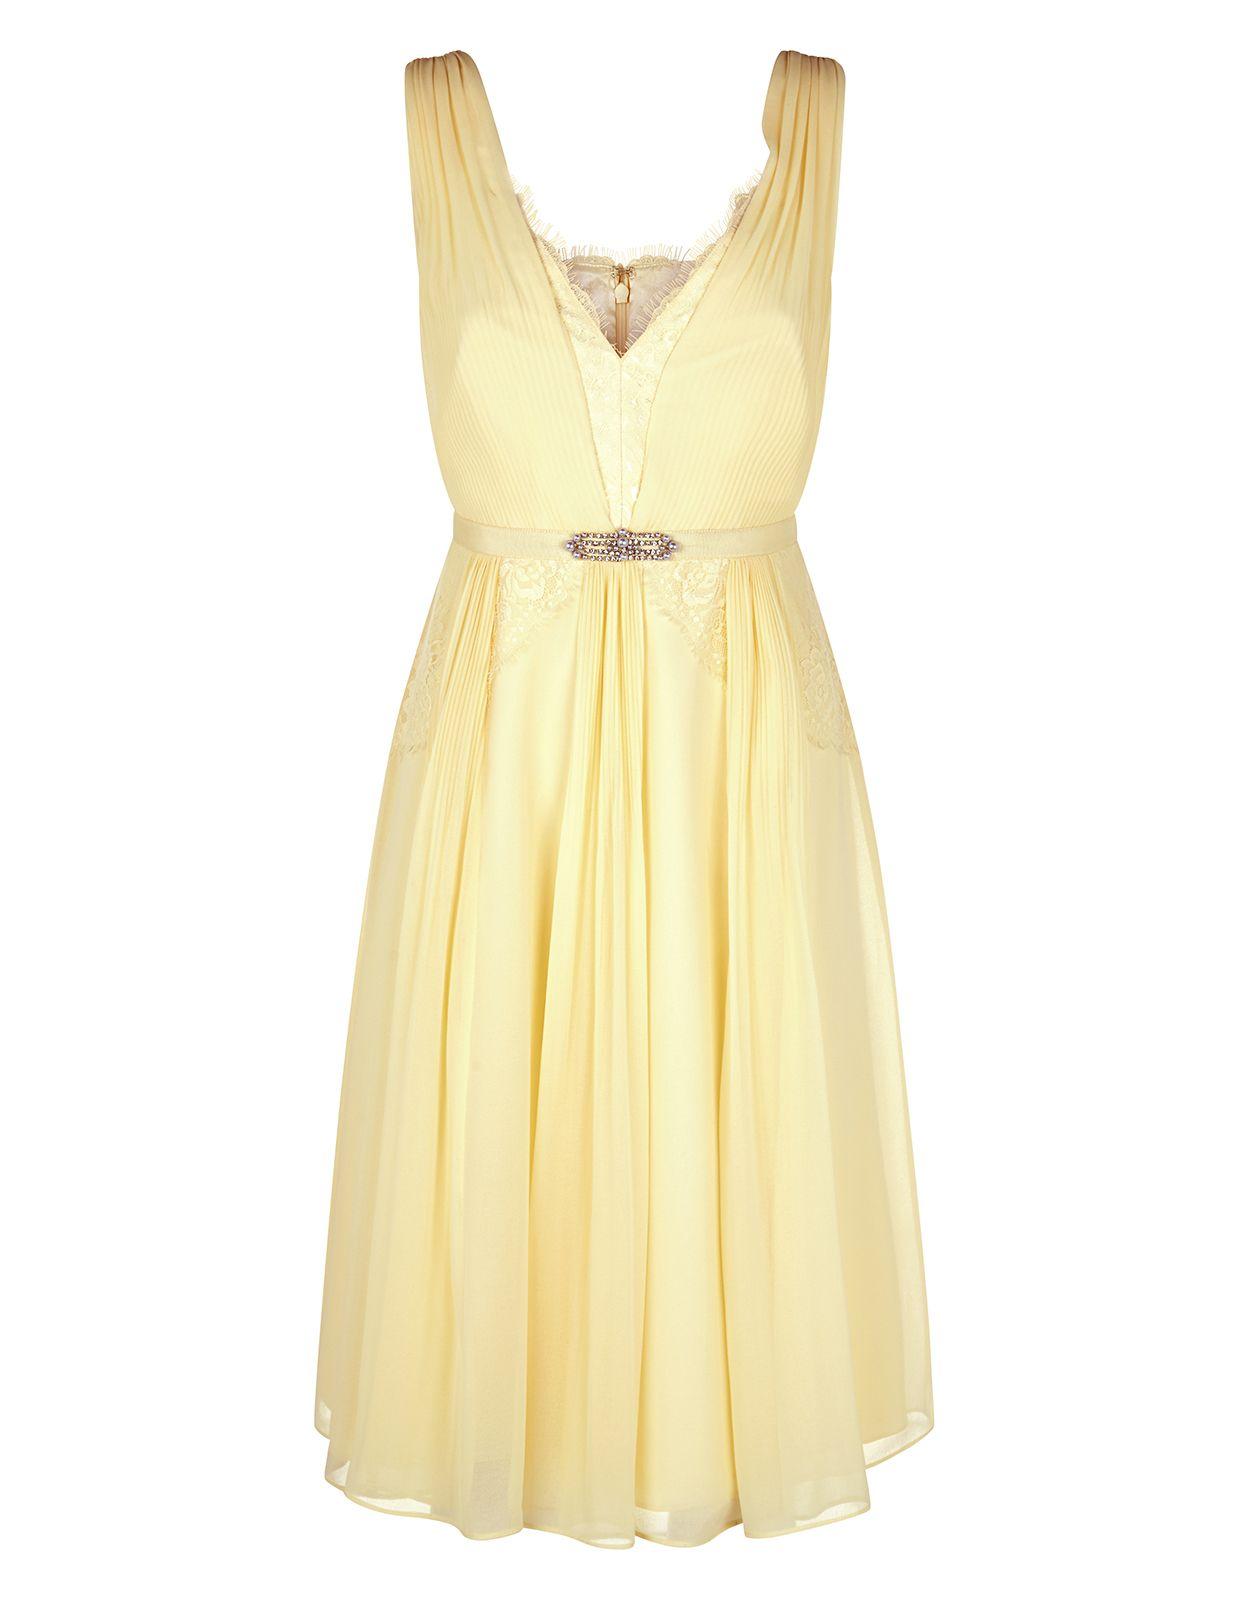 Madison dress yellow monsoon bridesmaids pinterest monsoon madison dress yellow monsoon ombrellifo Choice Image